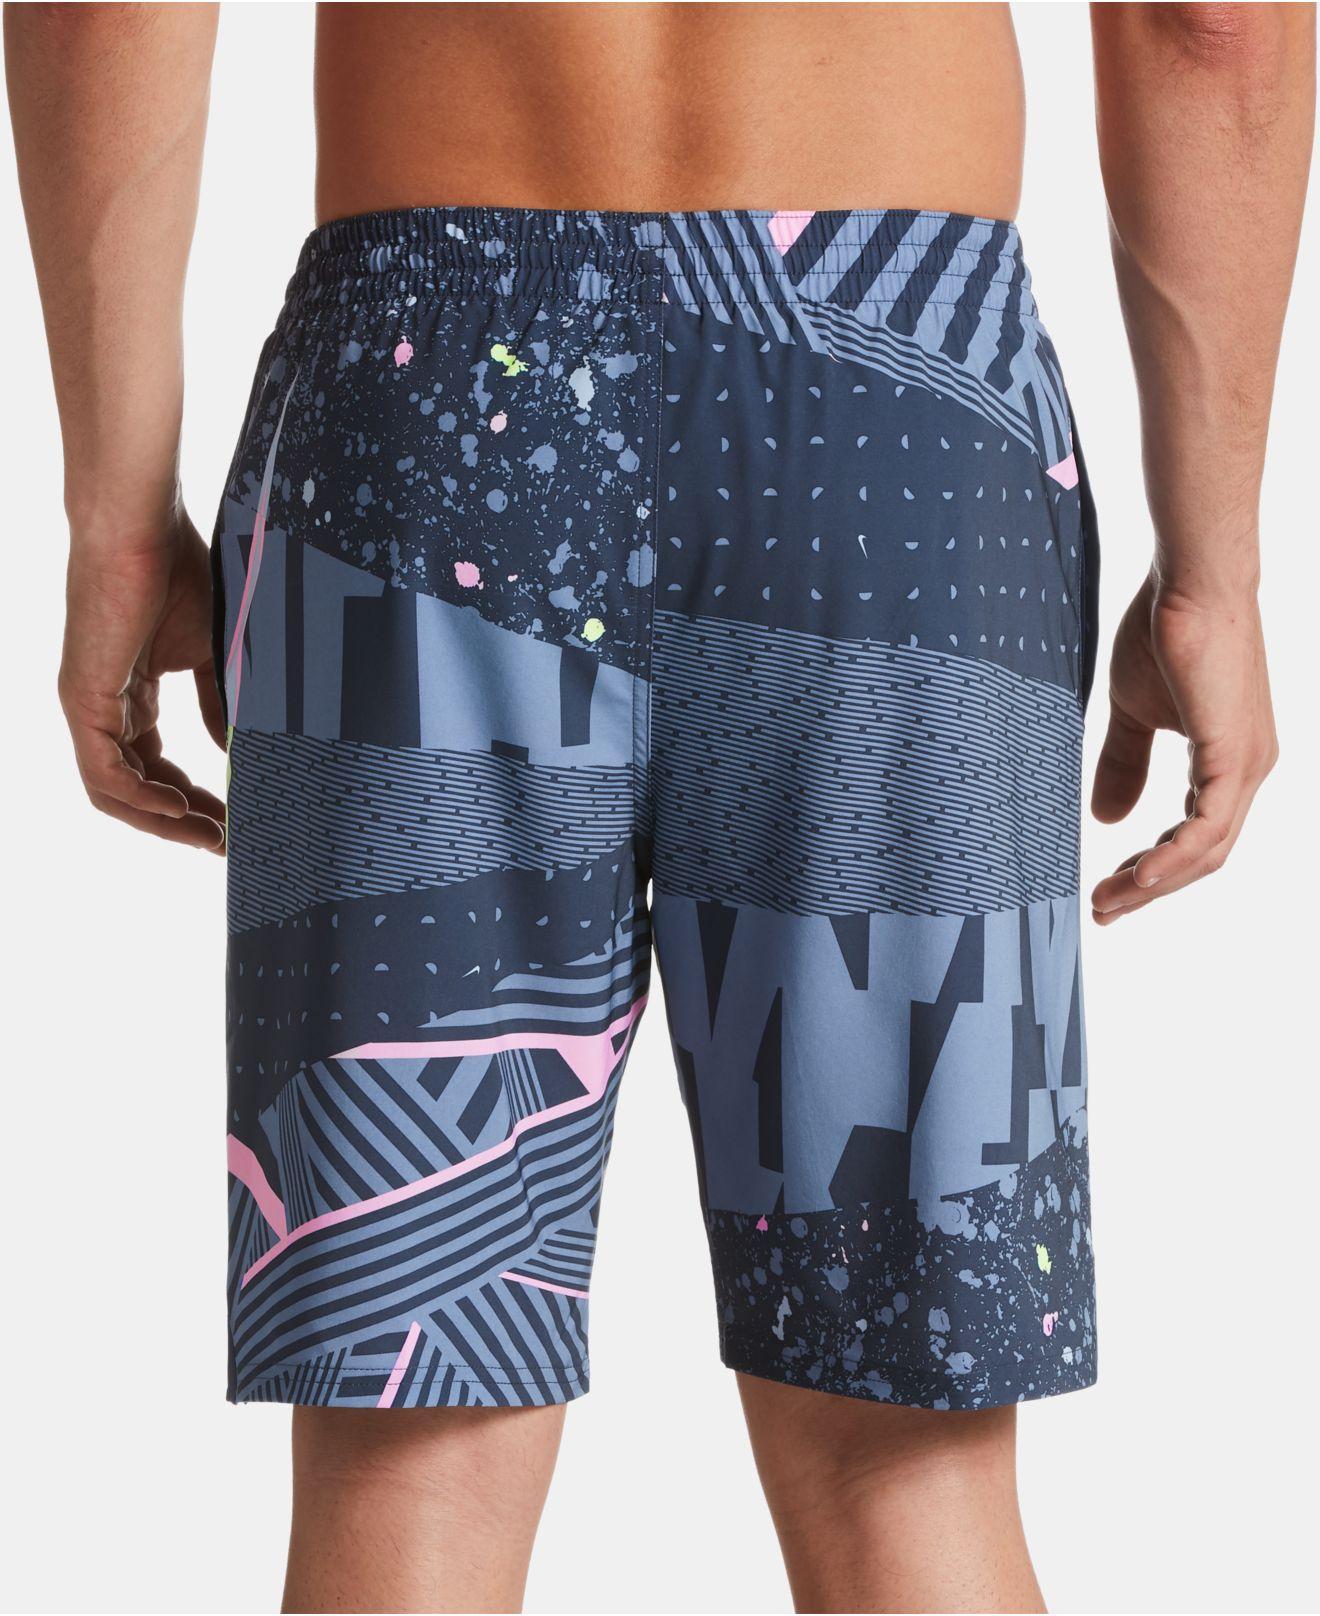 7e8137cea5758 Novelty & More Mr.Macy Surf Mens Quick Dry Swim Trunks Bathing Suit Beach  Shorts